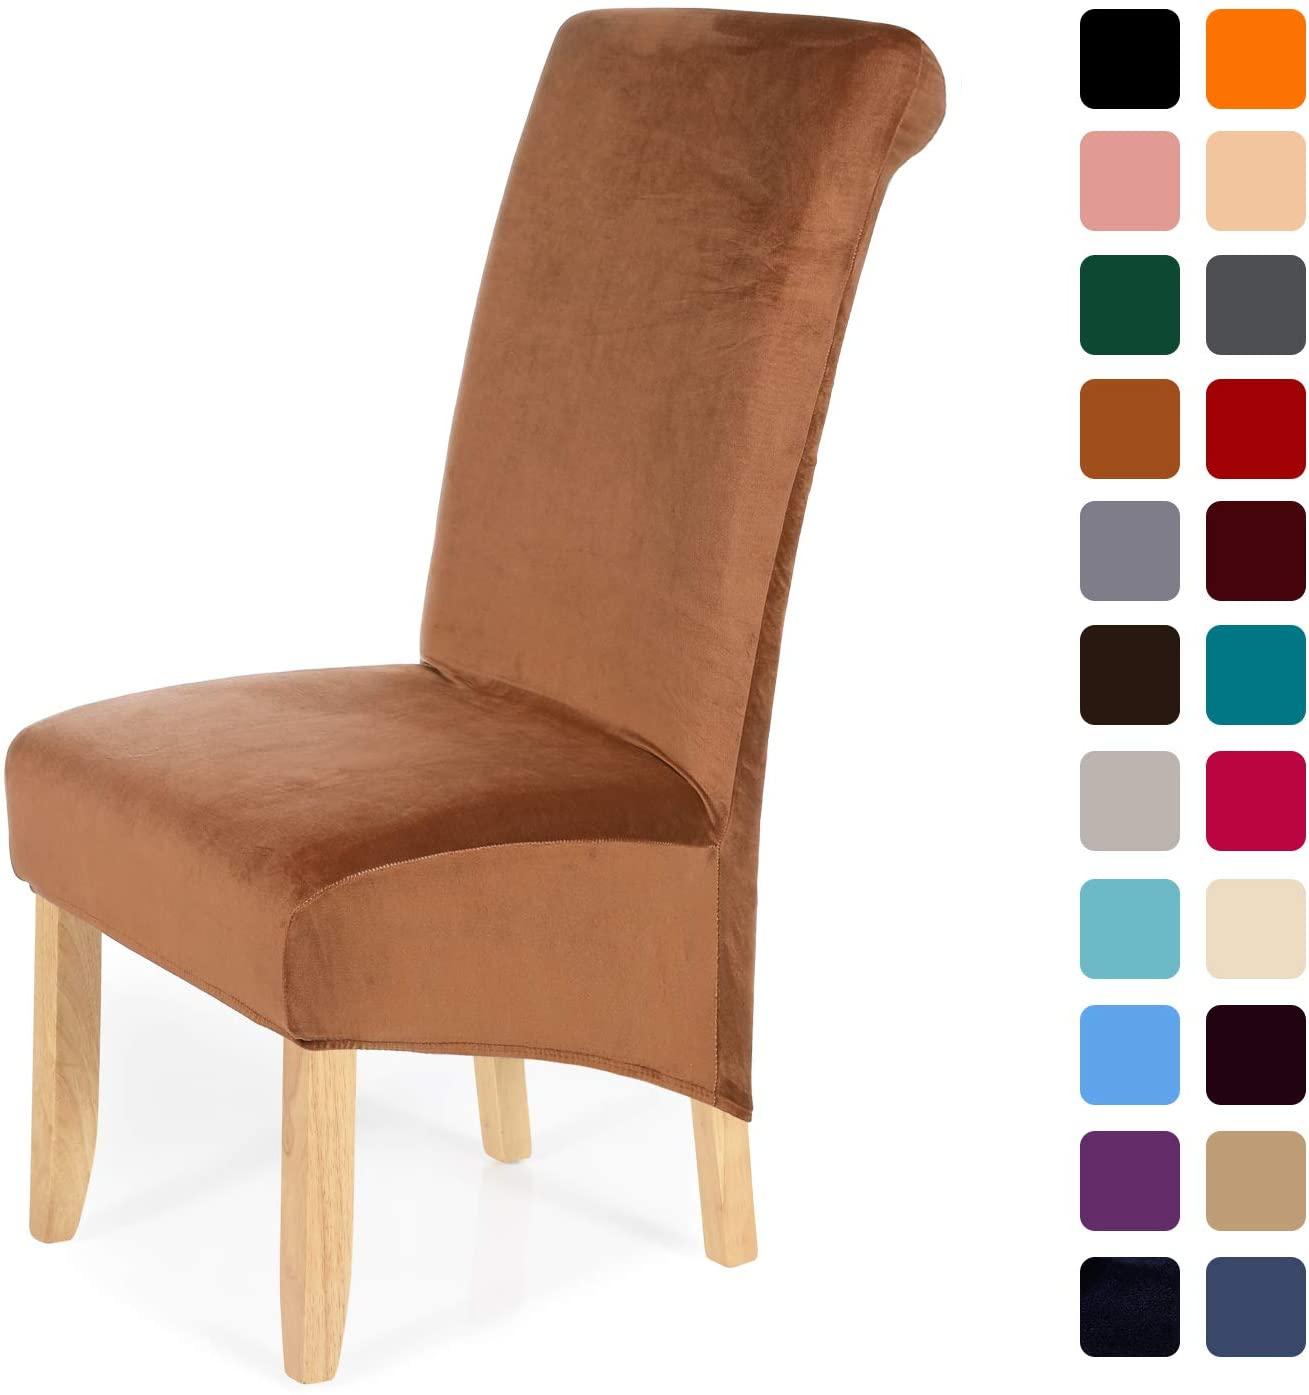 smiry Stretch Velvet Dining Chair Covers, Removable Washable Large Soft Dining Chair Slipcovers for Kitchen Home Restaurant (Set of 4, Camel)